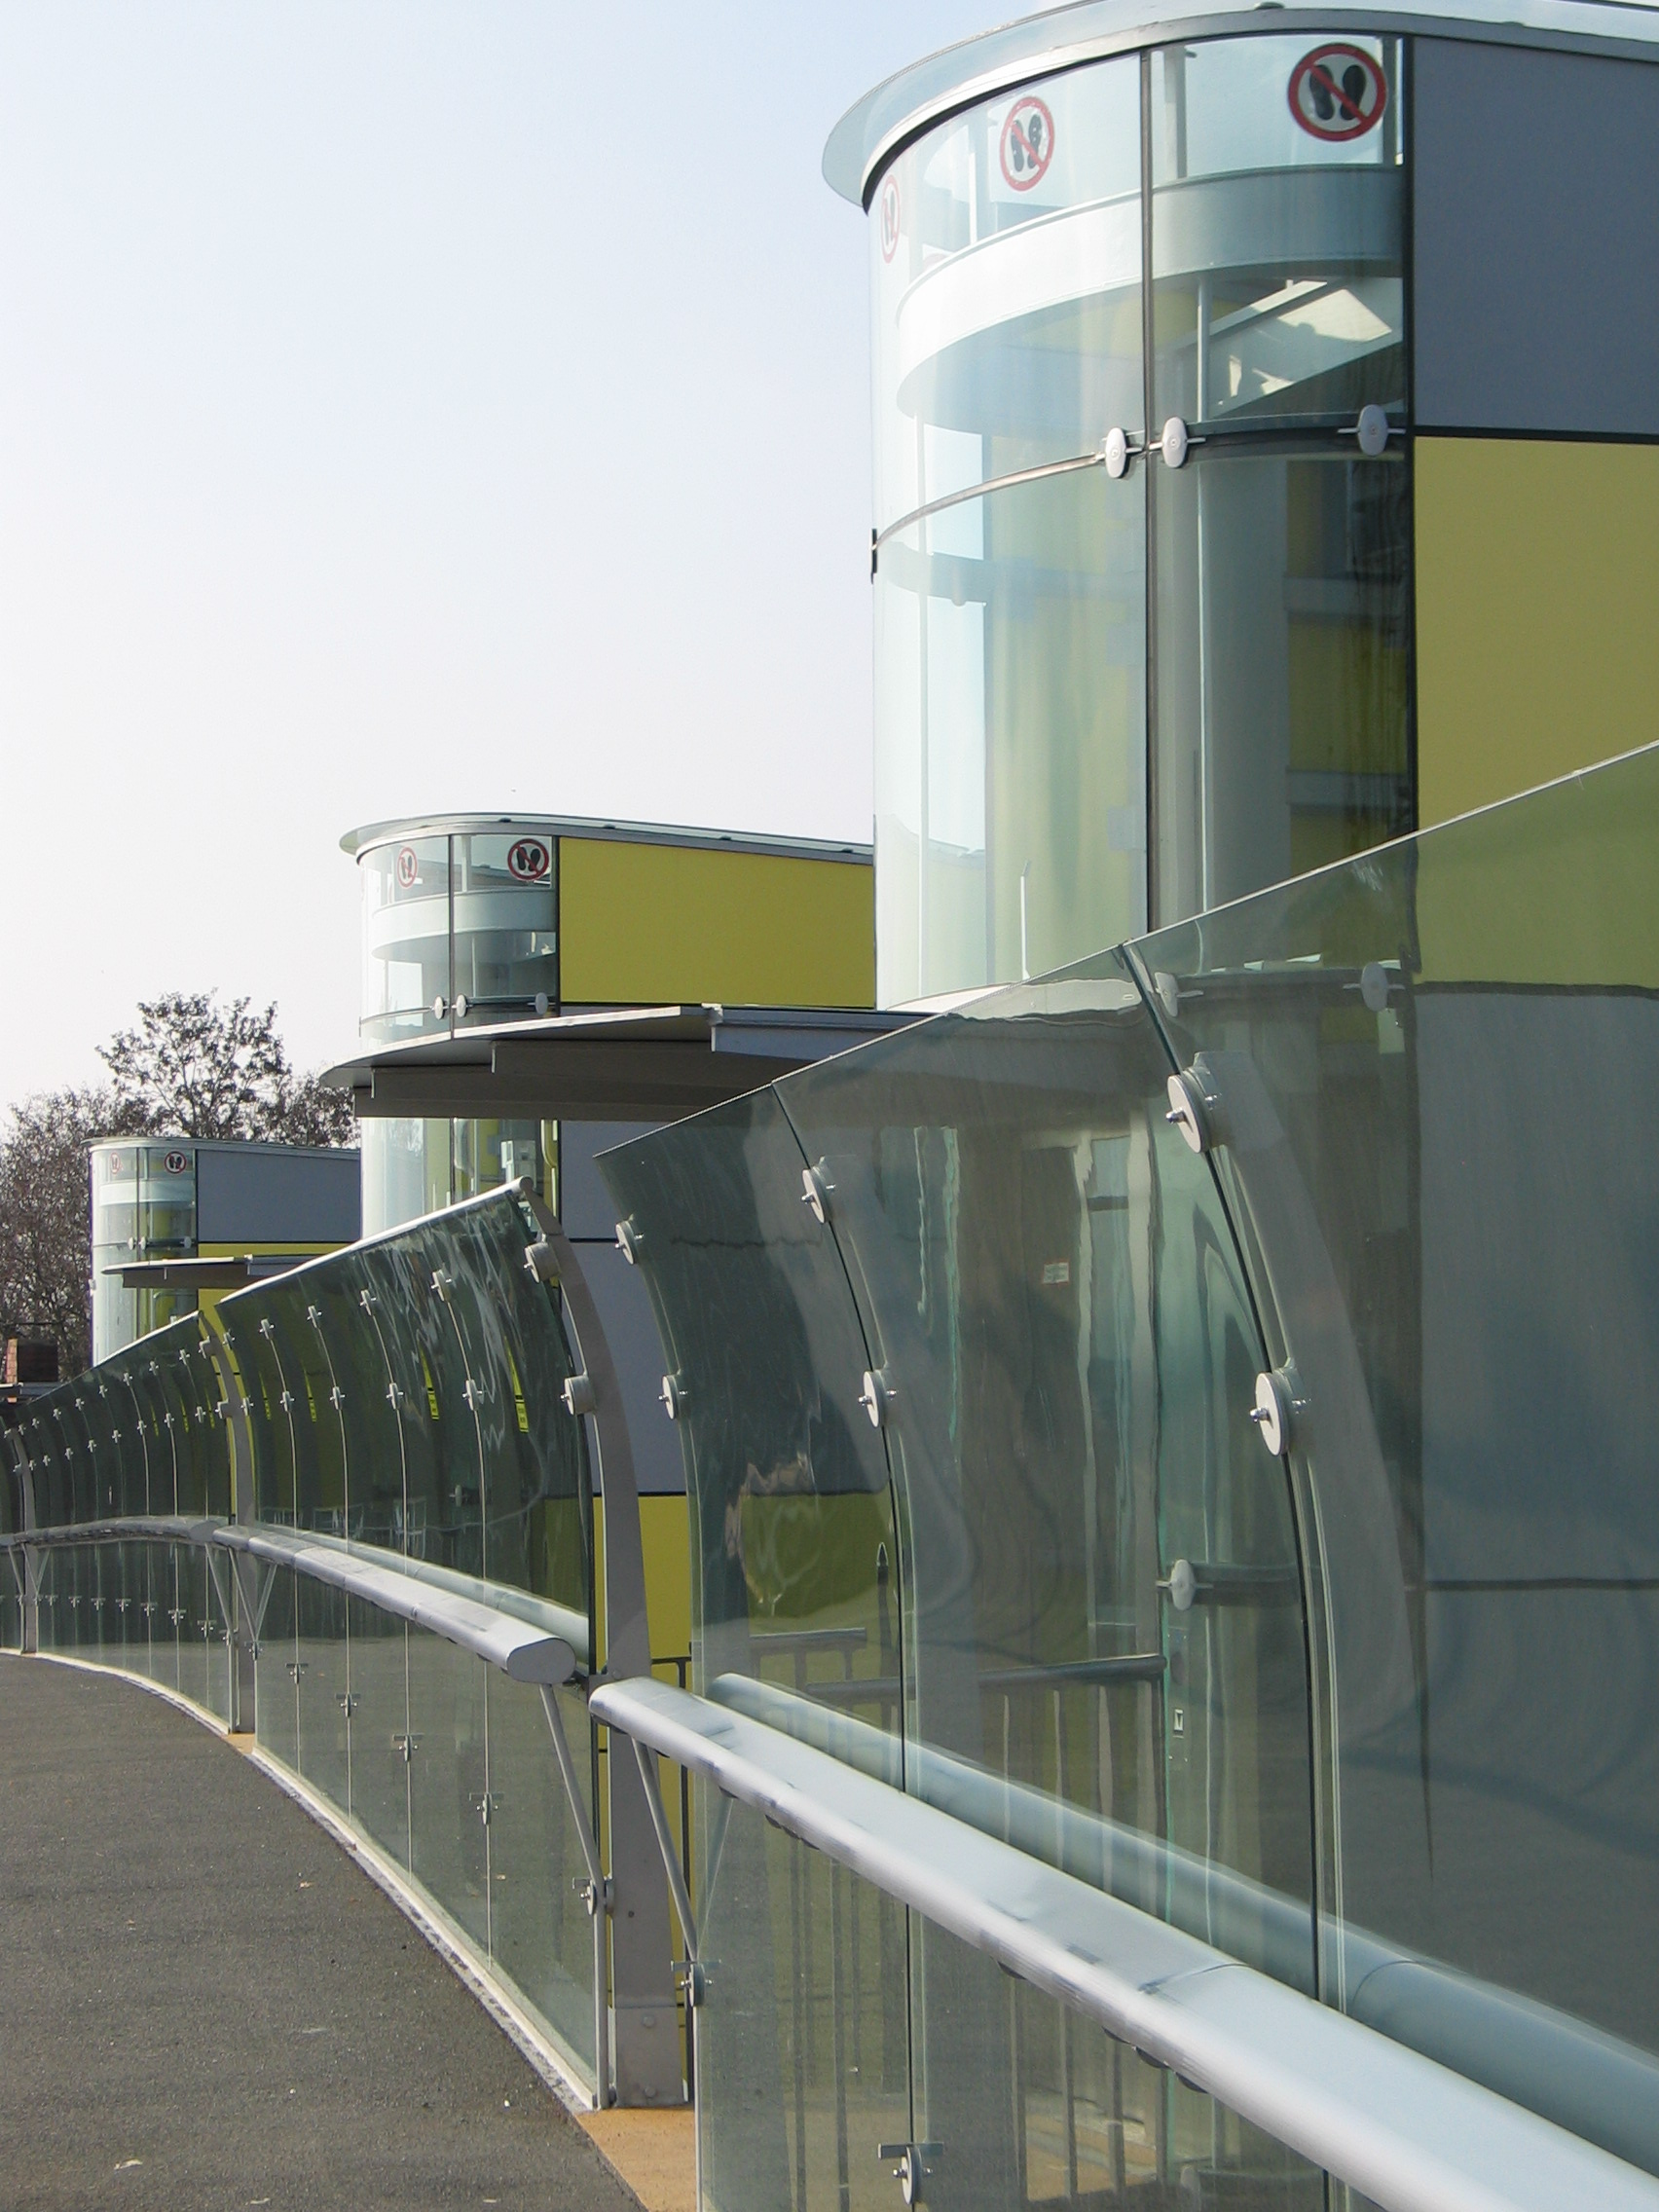 Bahnhof Wiesloch Walldorf